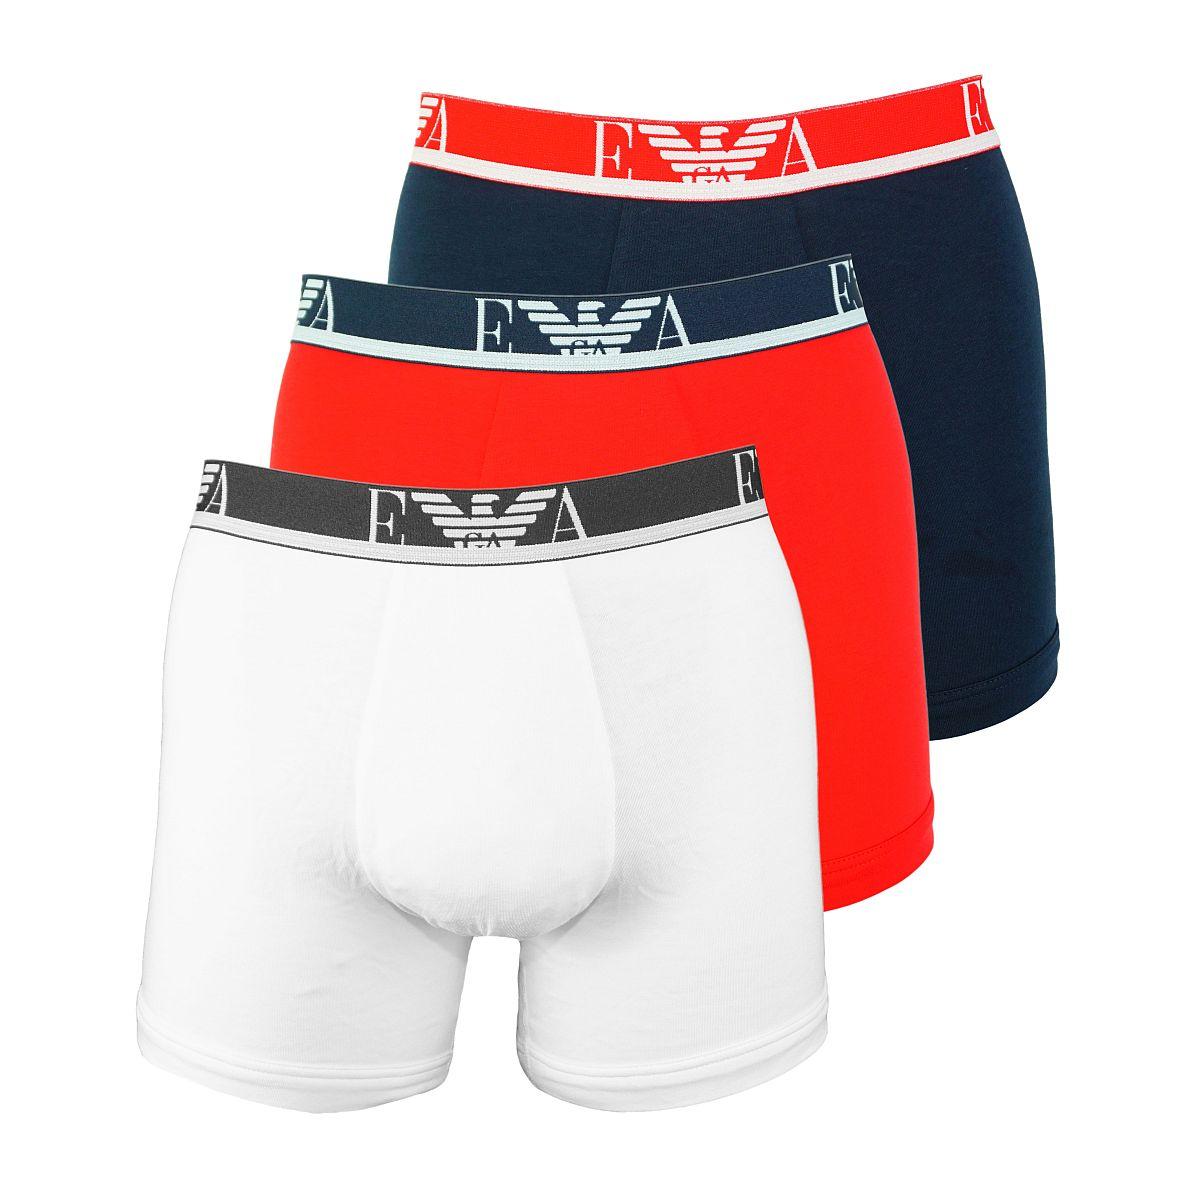 Emporio Armani 3er Pack Shorts Boxer Unterhose 111473 8P715 50710 BIANCO/MAR/TANGO RED W18-EABZ1